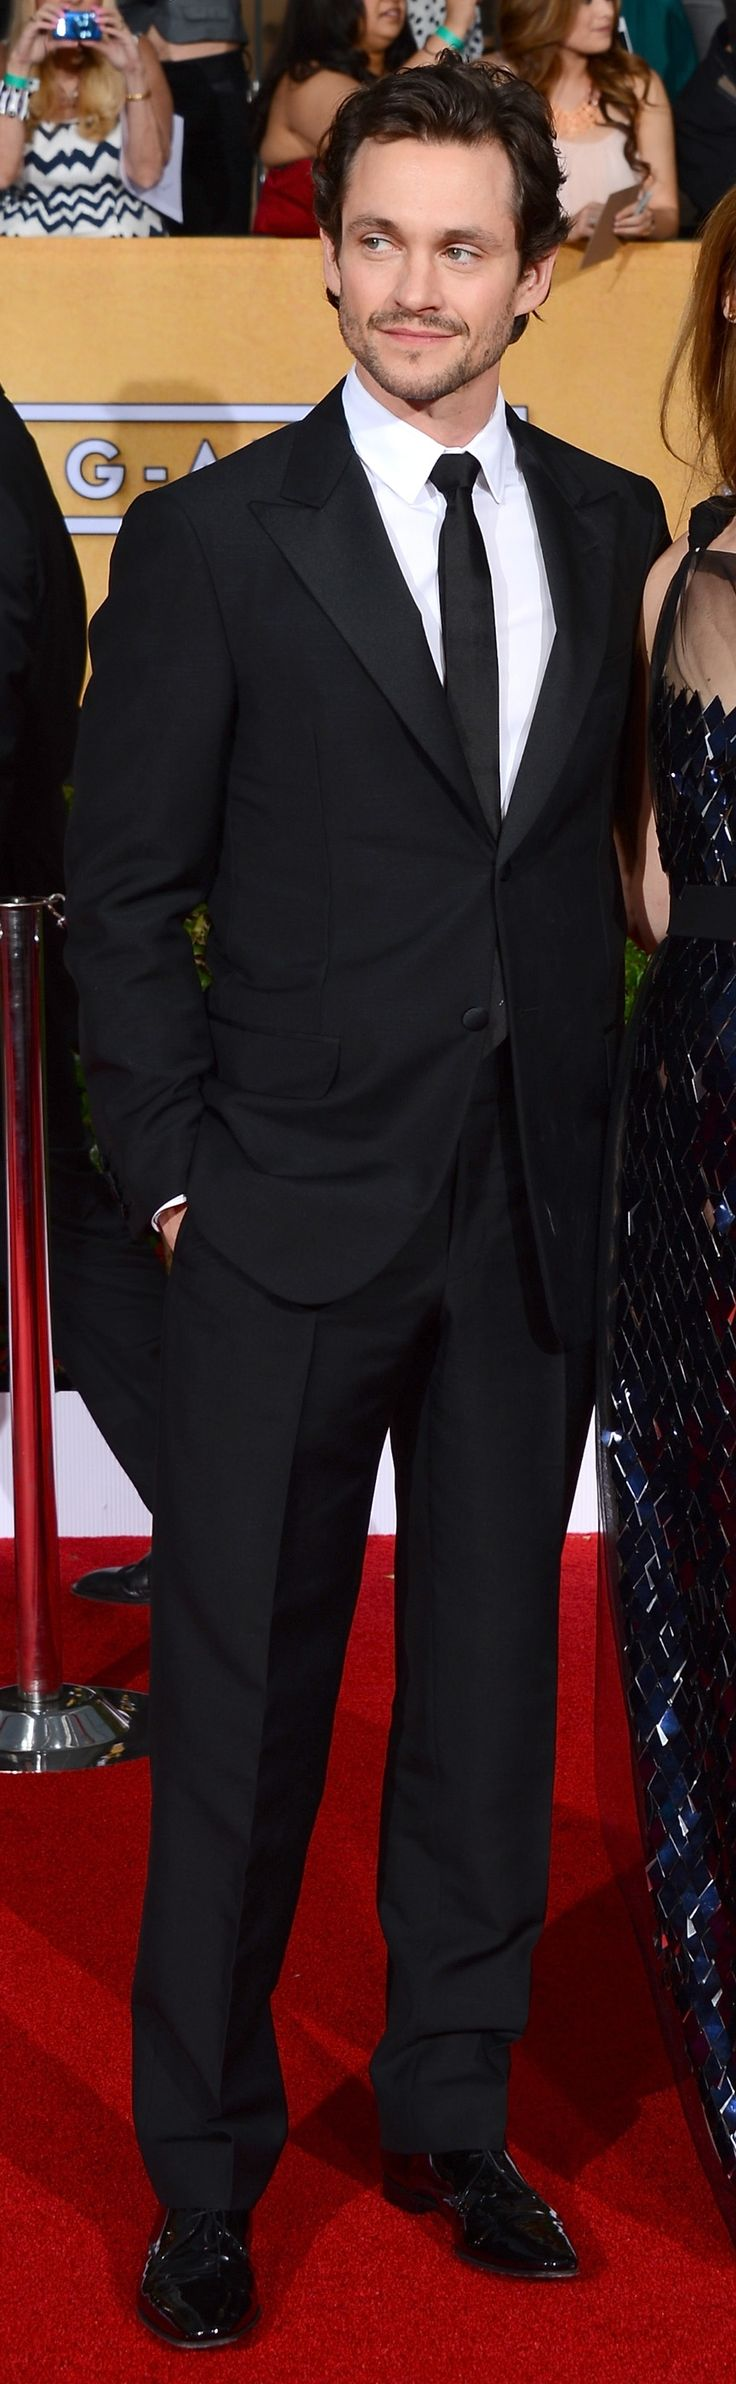 Hugh Dancy - 20th Annual Screen Actors Guild Awards, 2014 (high quality)